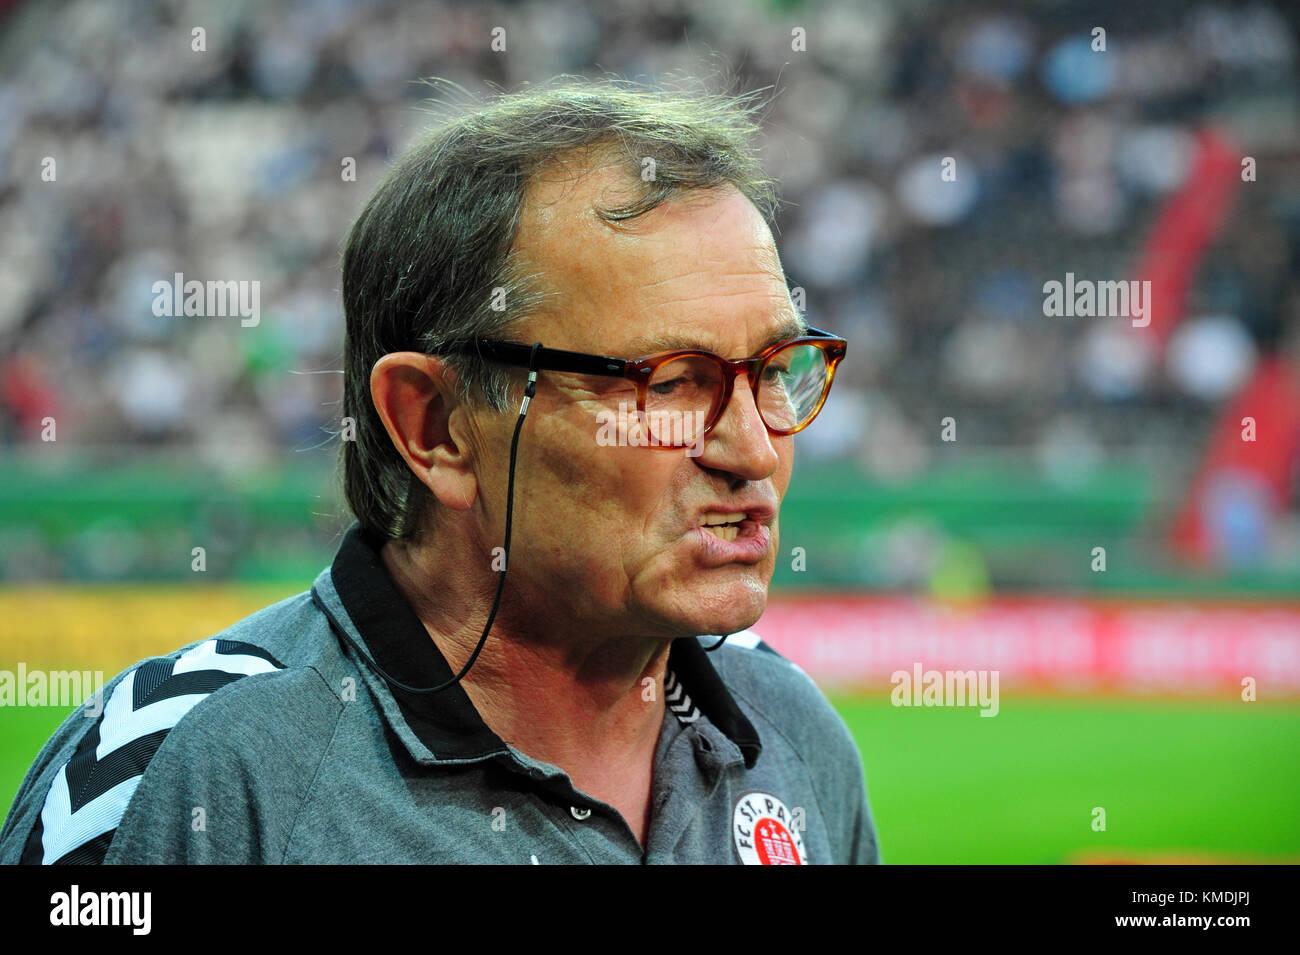 FC St. Pauli vs. Borussia Moenchengladbach, DFB-Pokal: EUROPA, DEUTSCHLAND, HAMBURG, 10.08.2015: FCSP Trainer Ewald - Stock Image